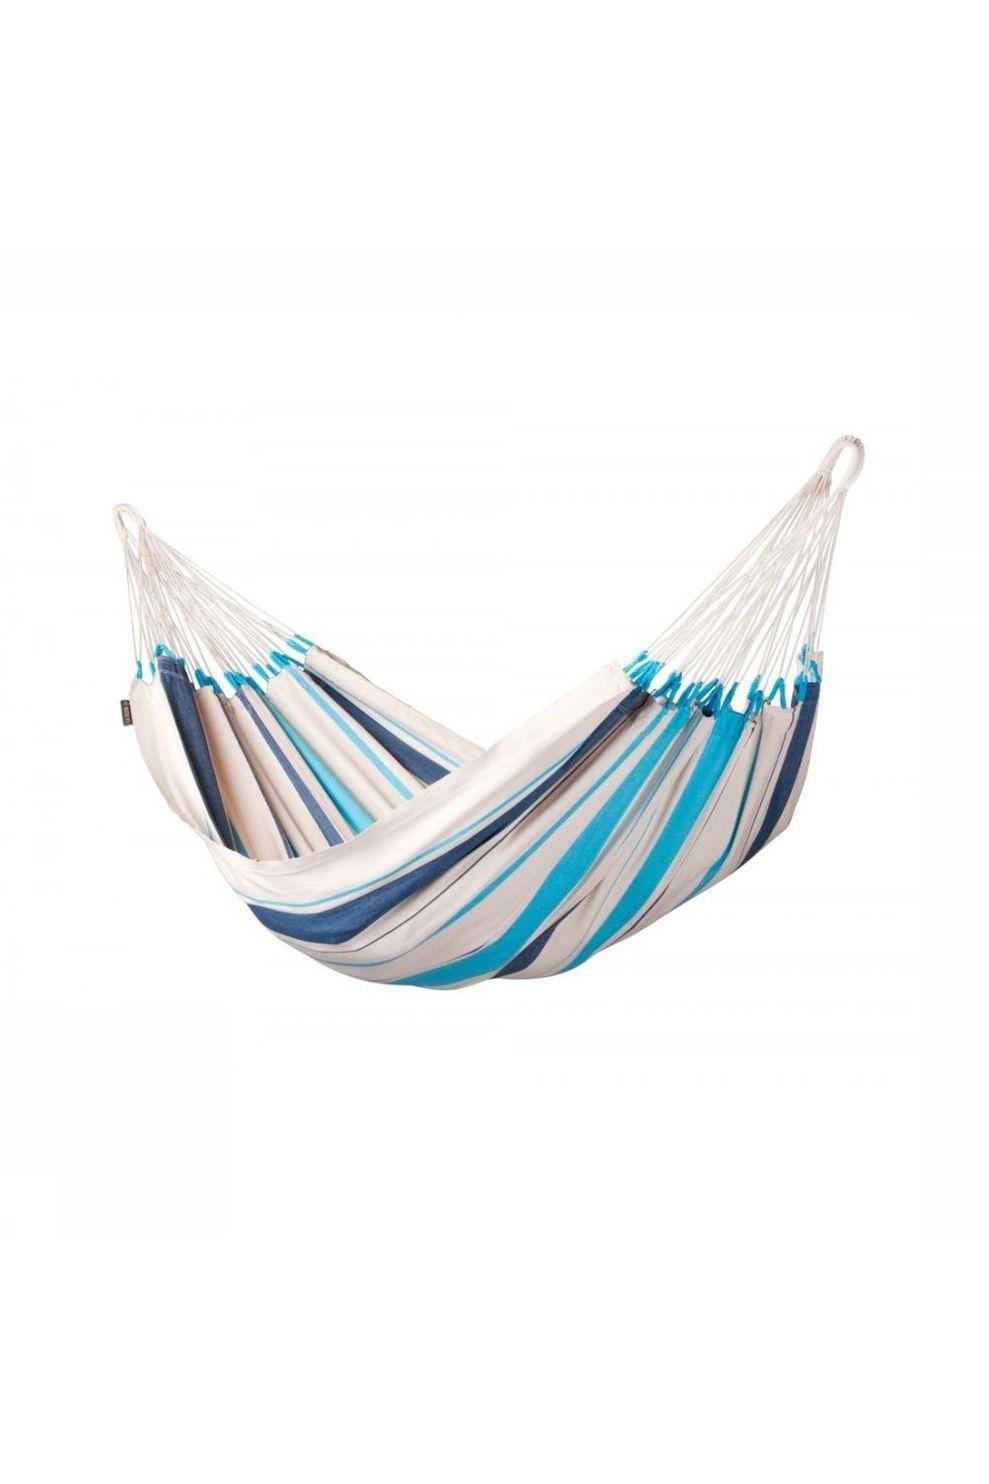 La Siesta Hangmat Caribeña Single - Blauw/Wit